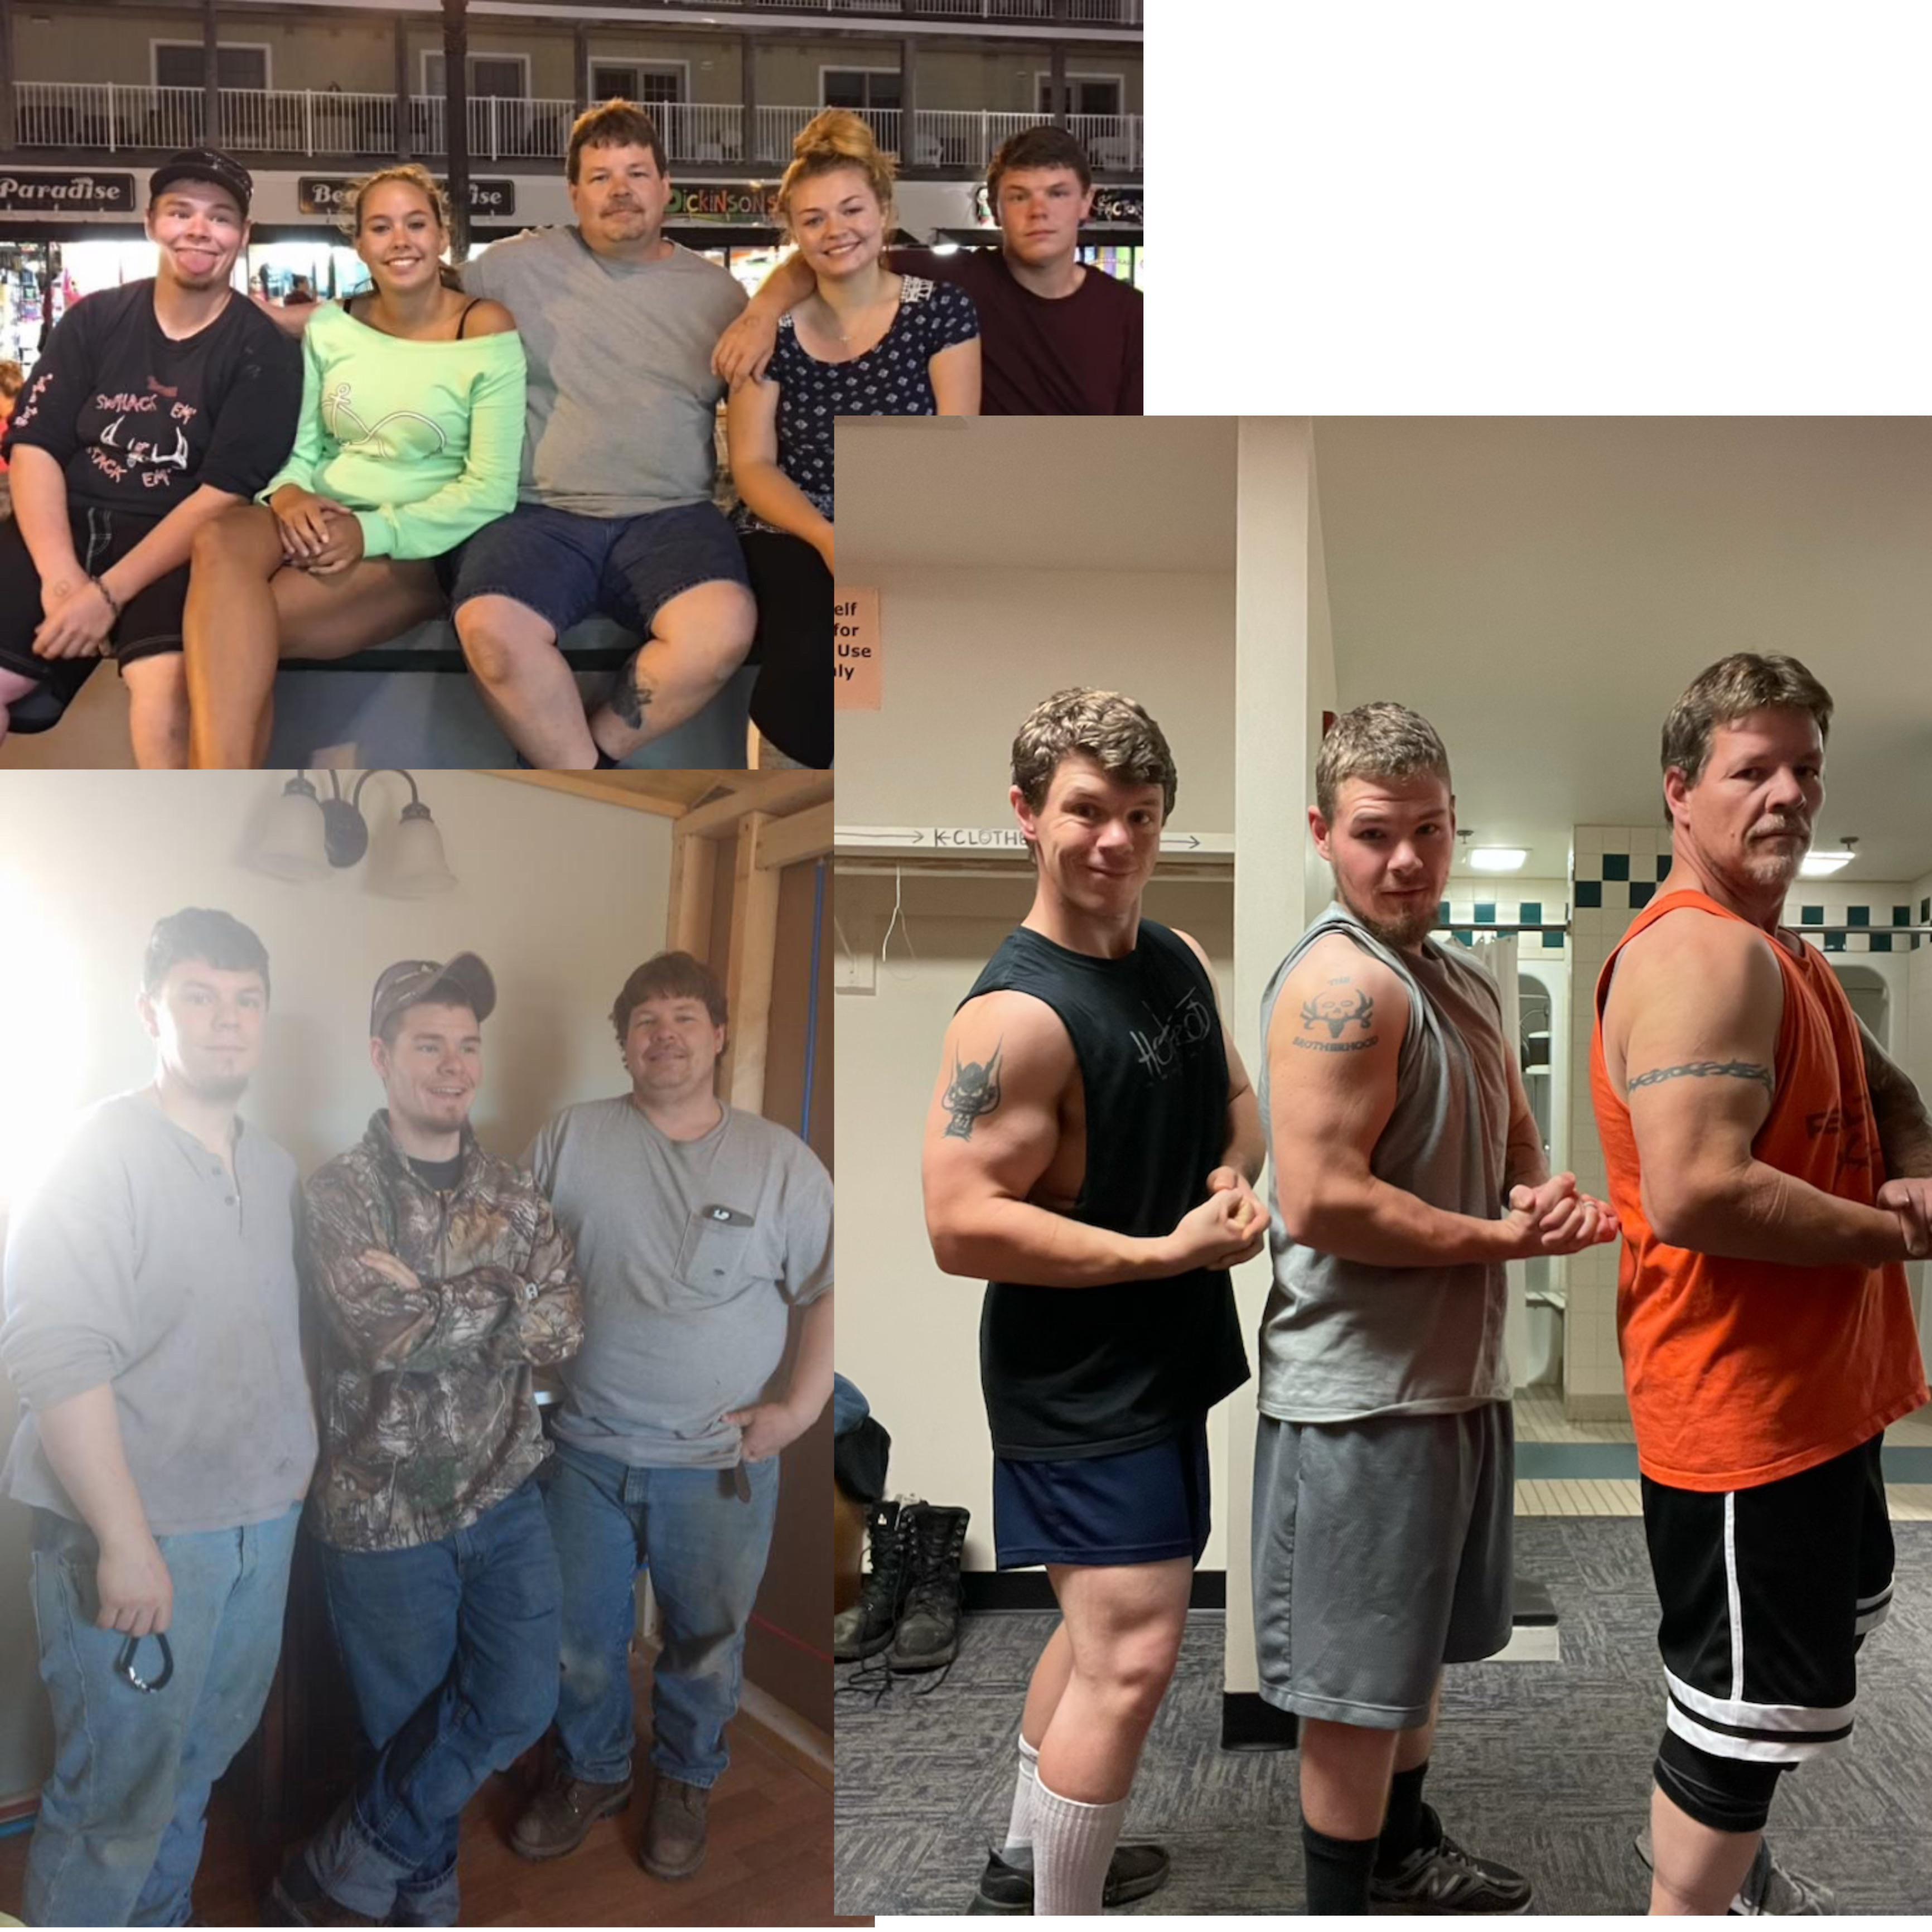 135 lbs Weight Loss 5'5 Male 300 lbs to 165 lbs